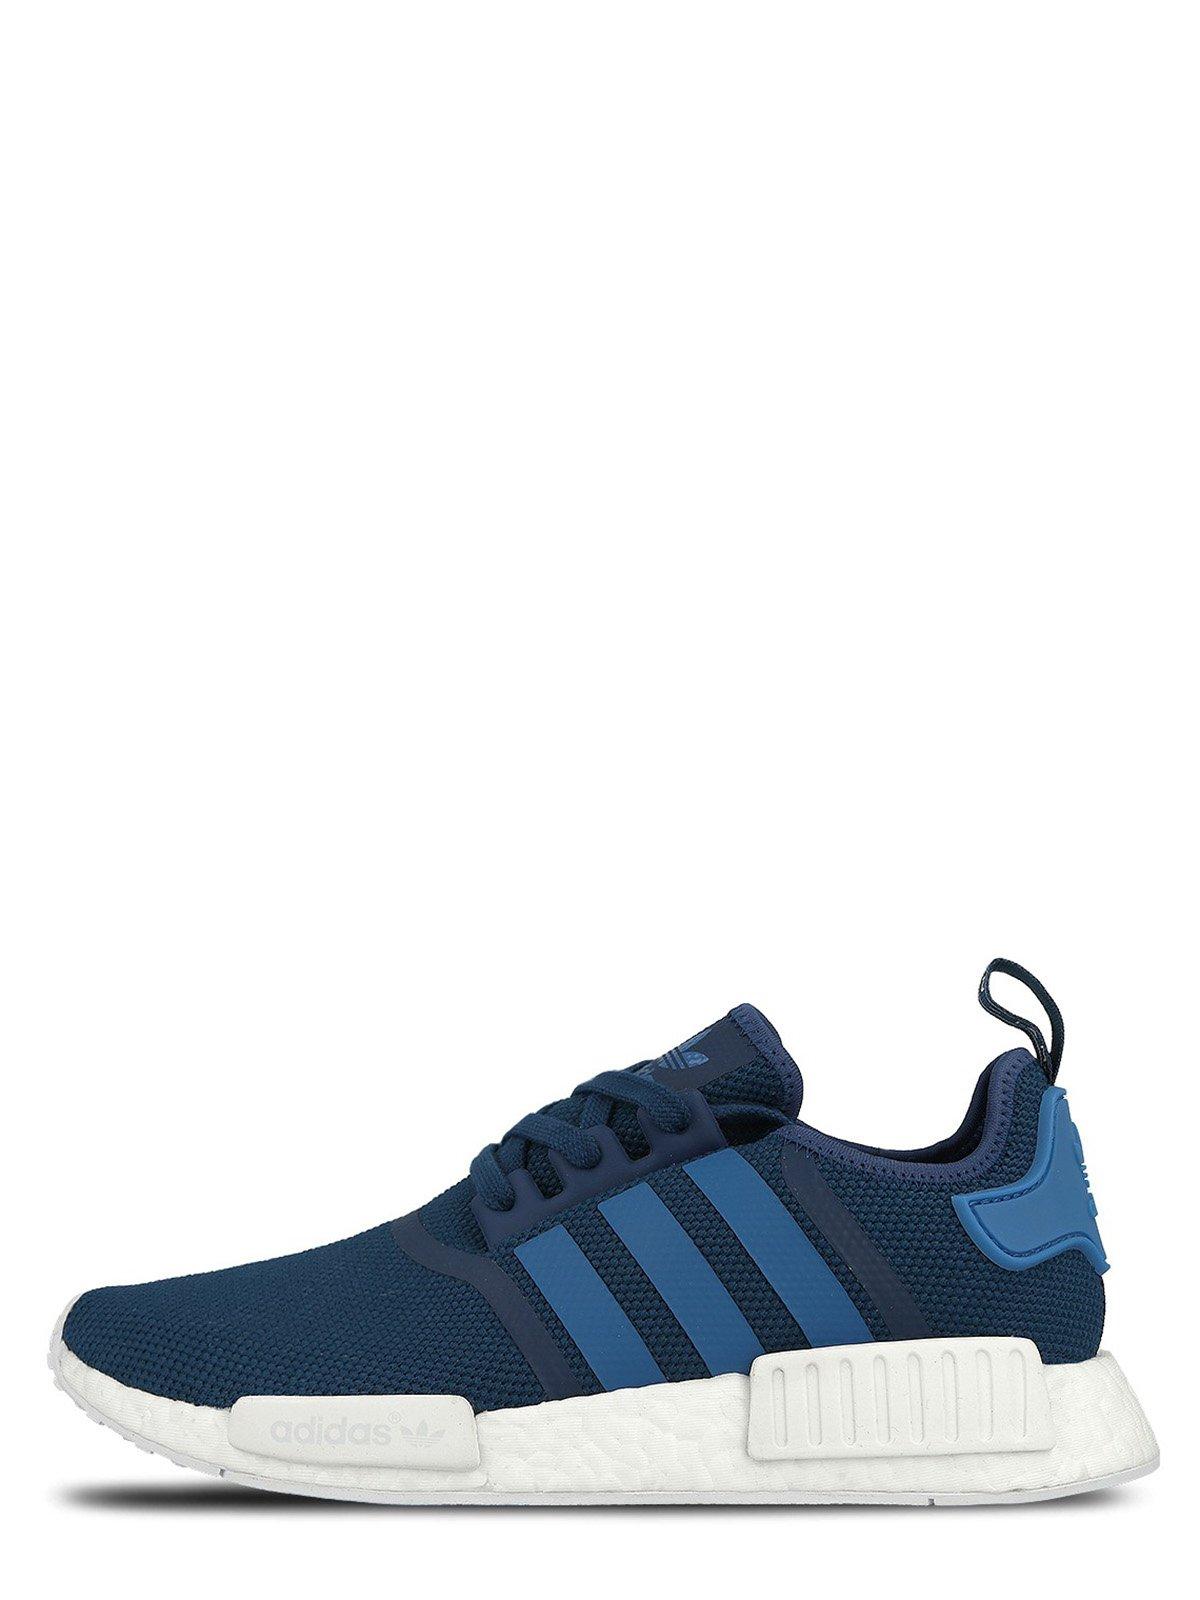 Кроссовки синие | 2977812